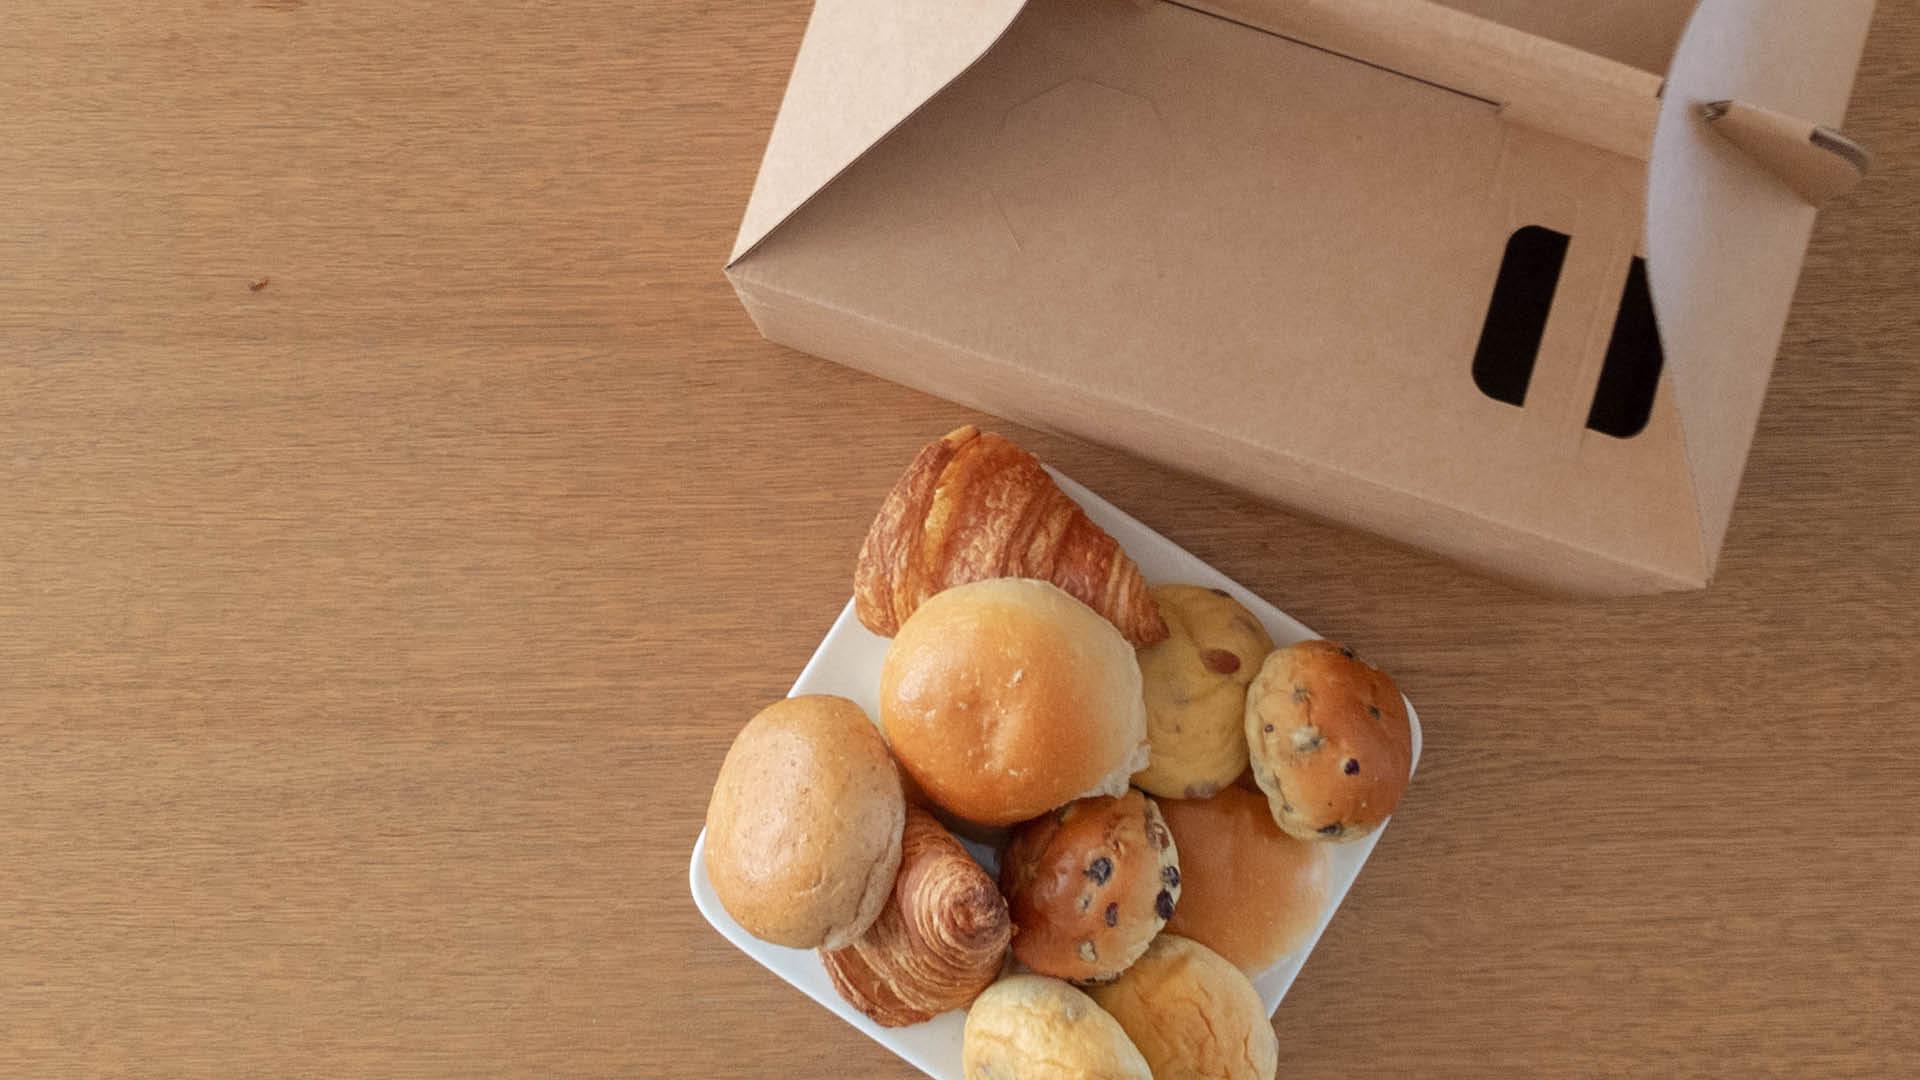 Slider ontbijtservice2